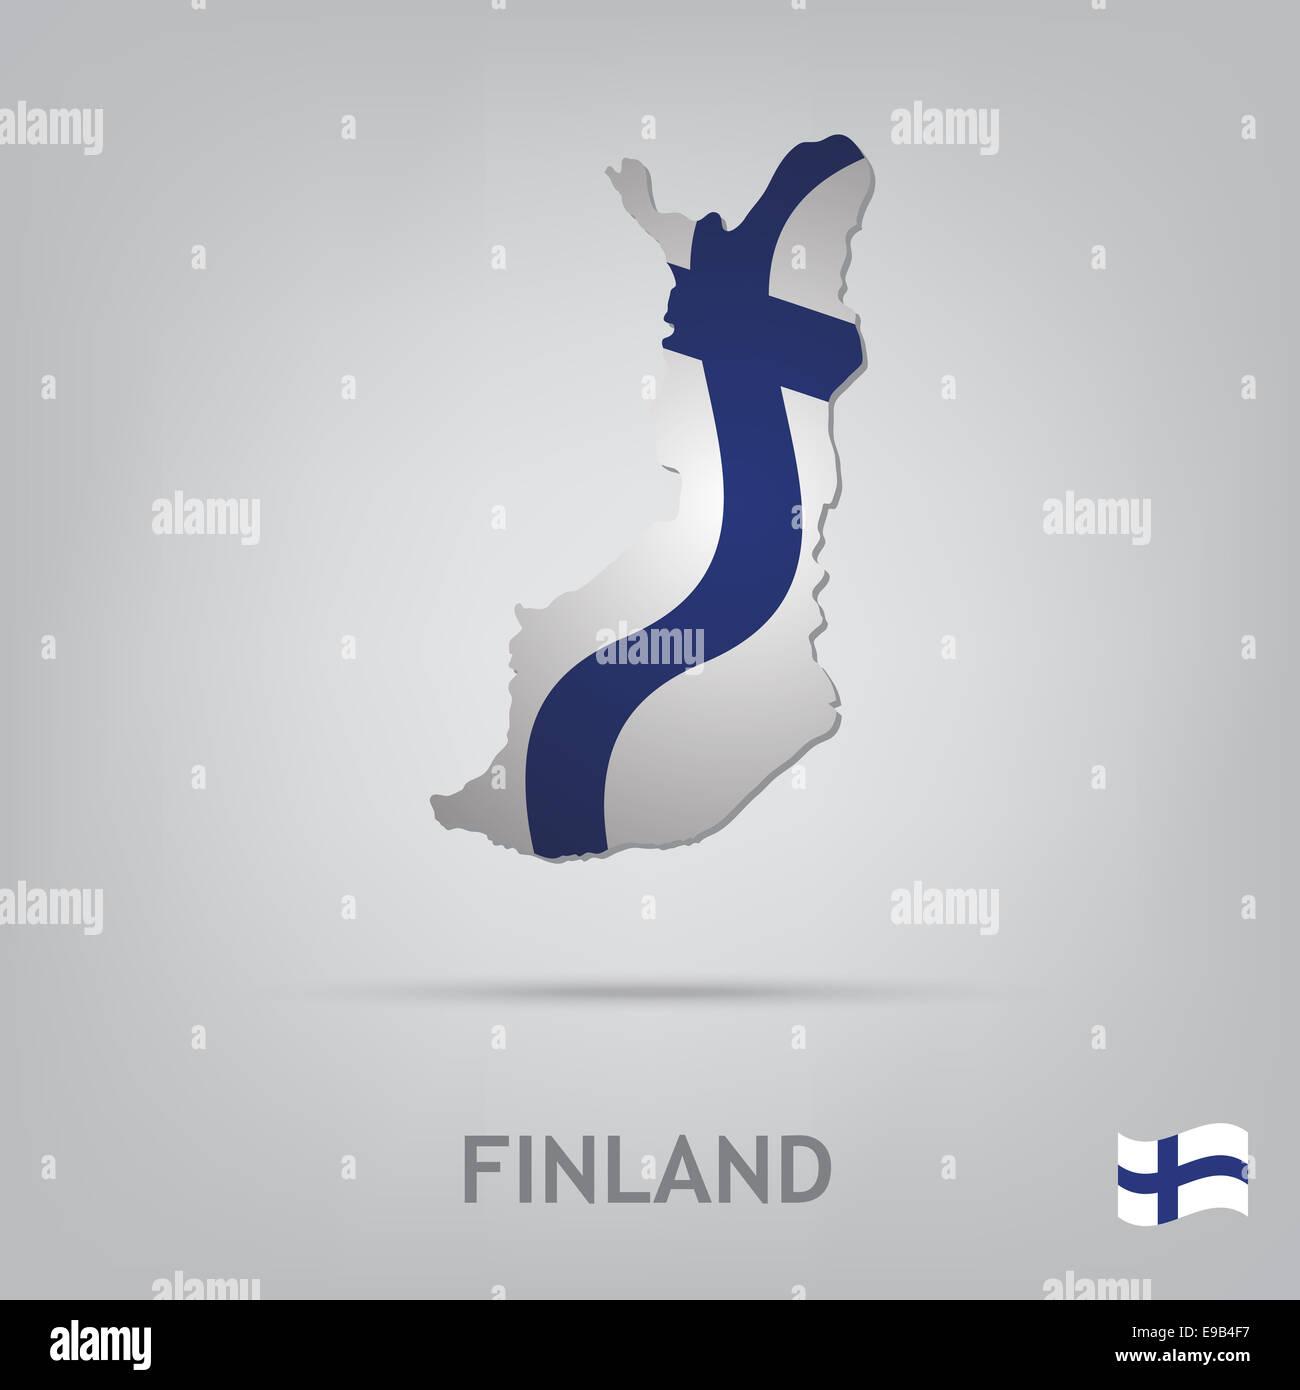 finland - Stock Image